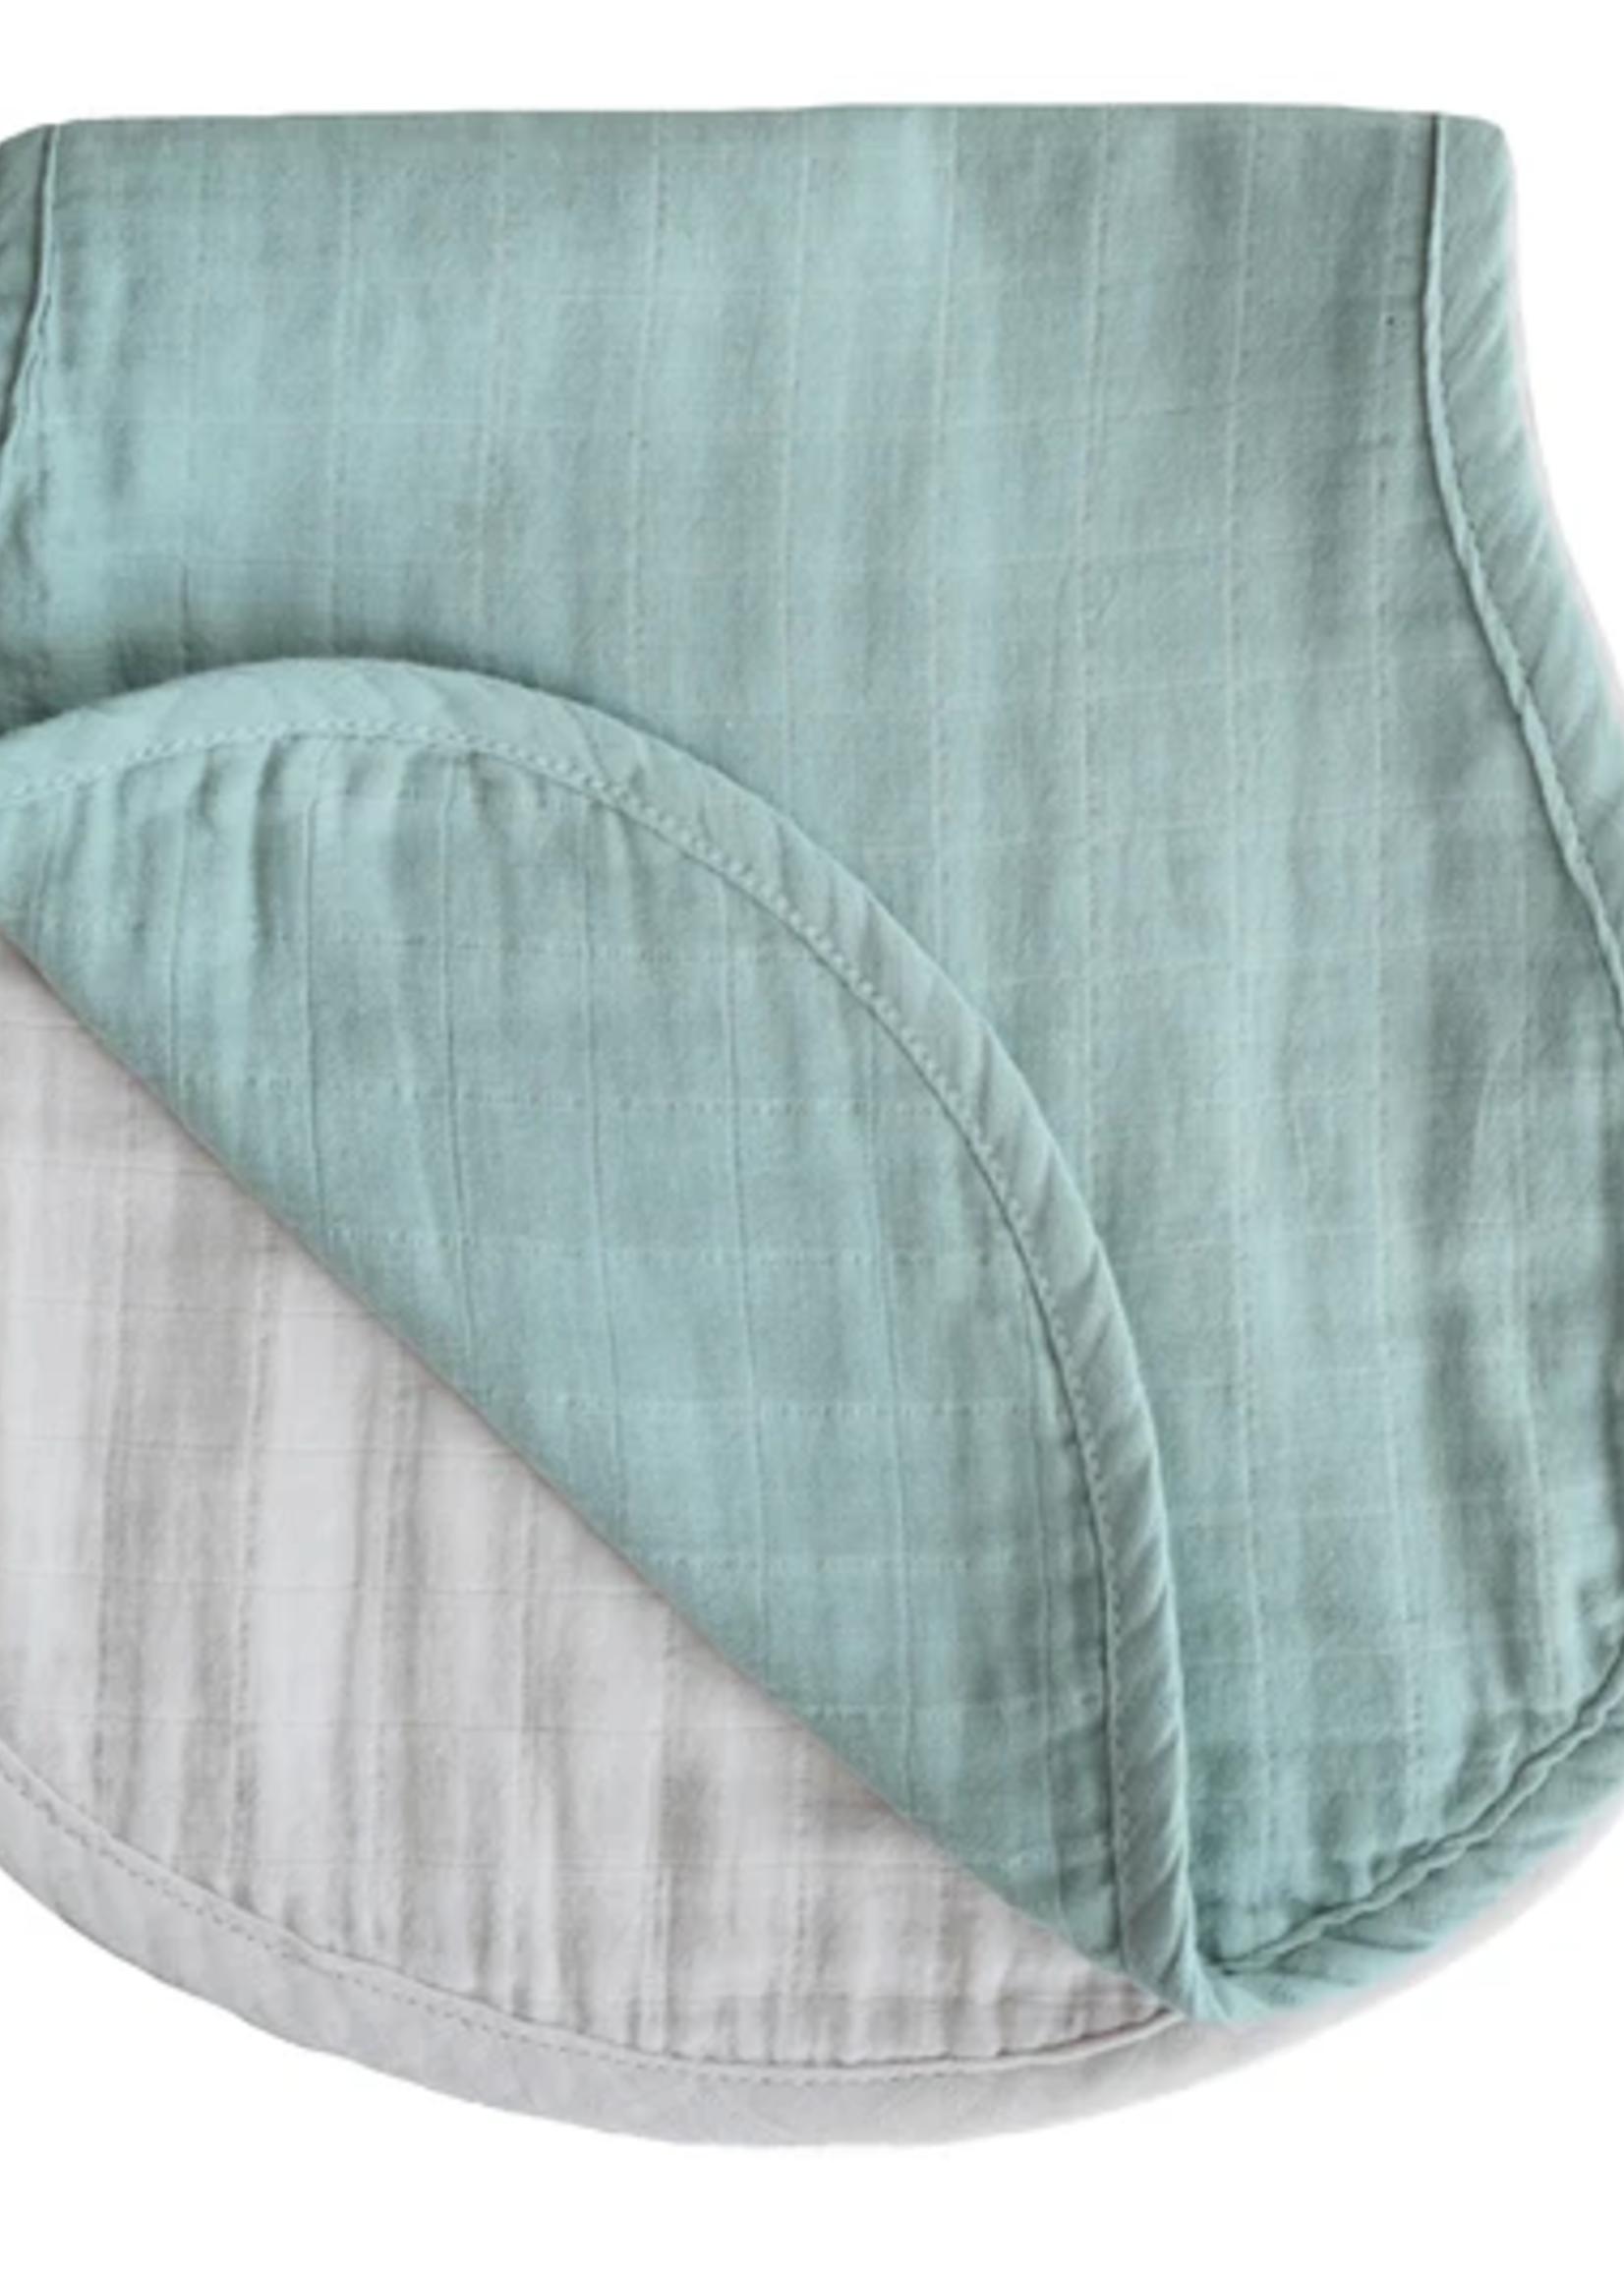 Elitaire Petite Muslin 2-Pack Burp Cloth in Green/Fog